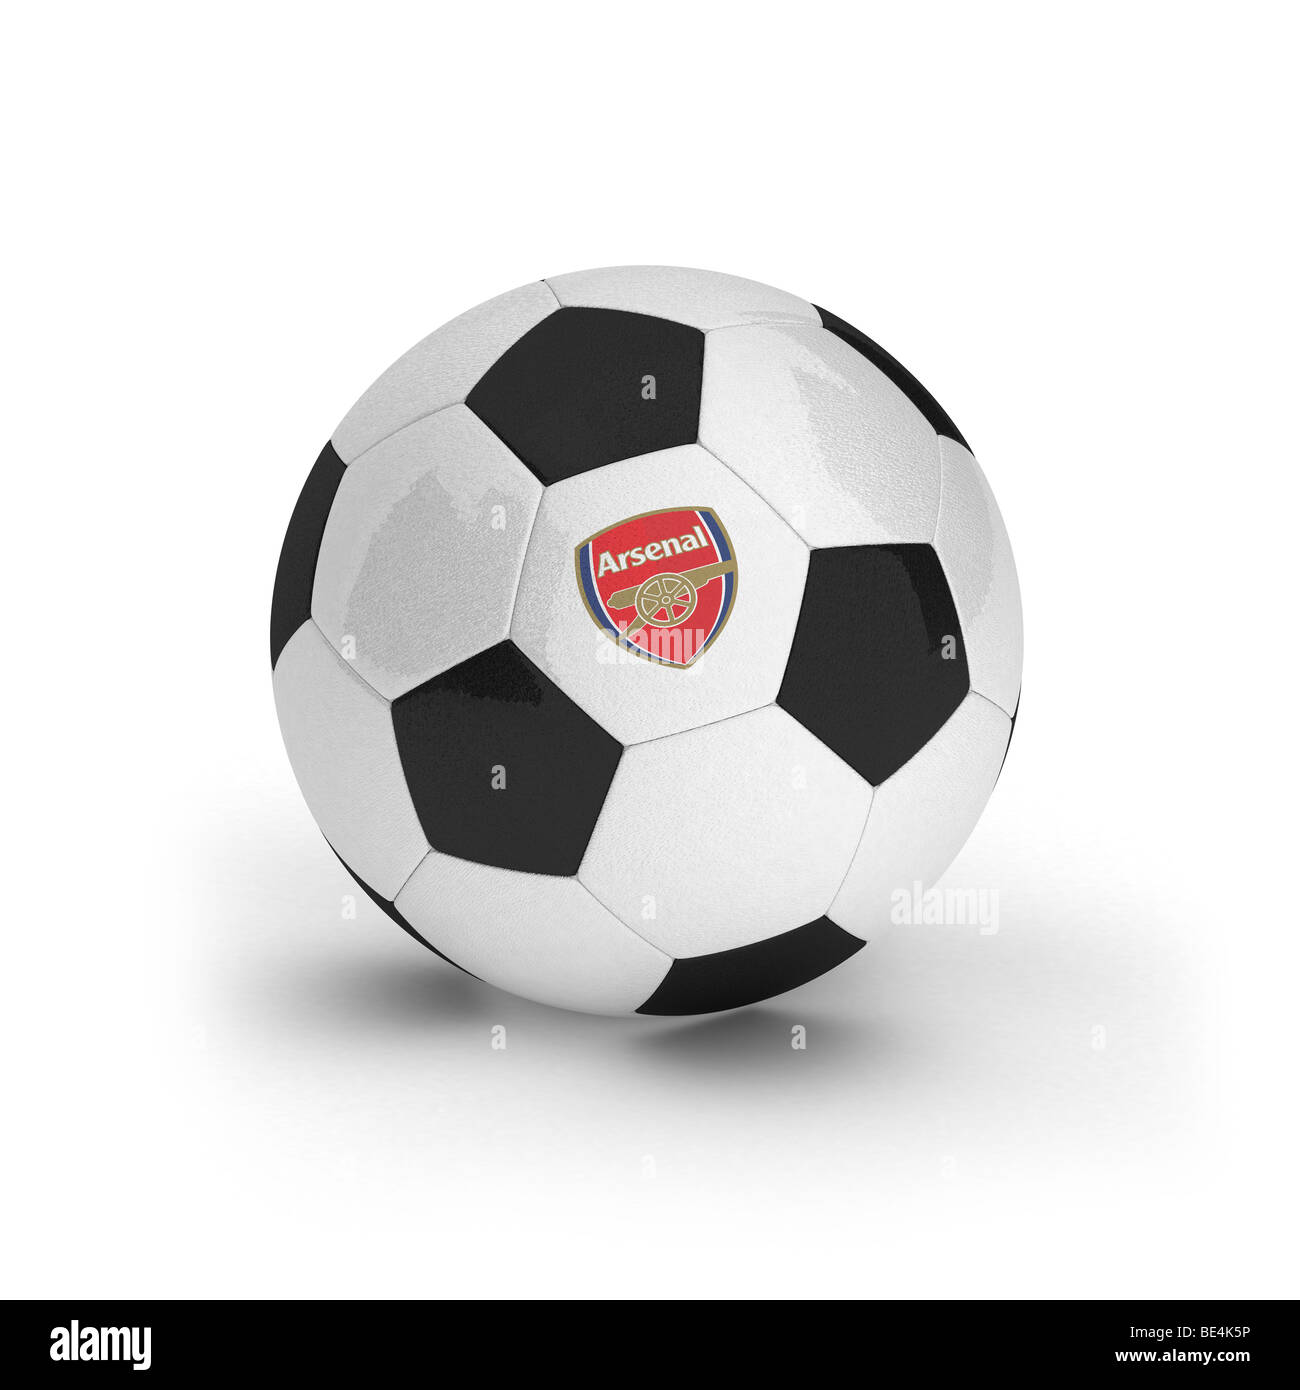 Arsenal F.C. football - Stock Image